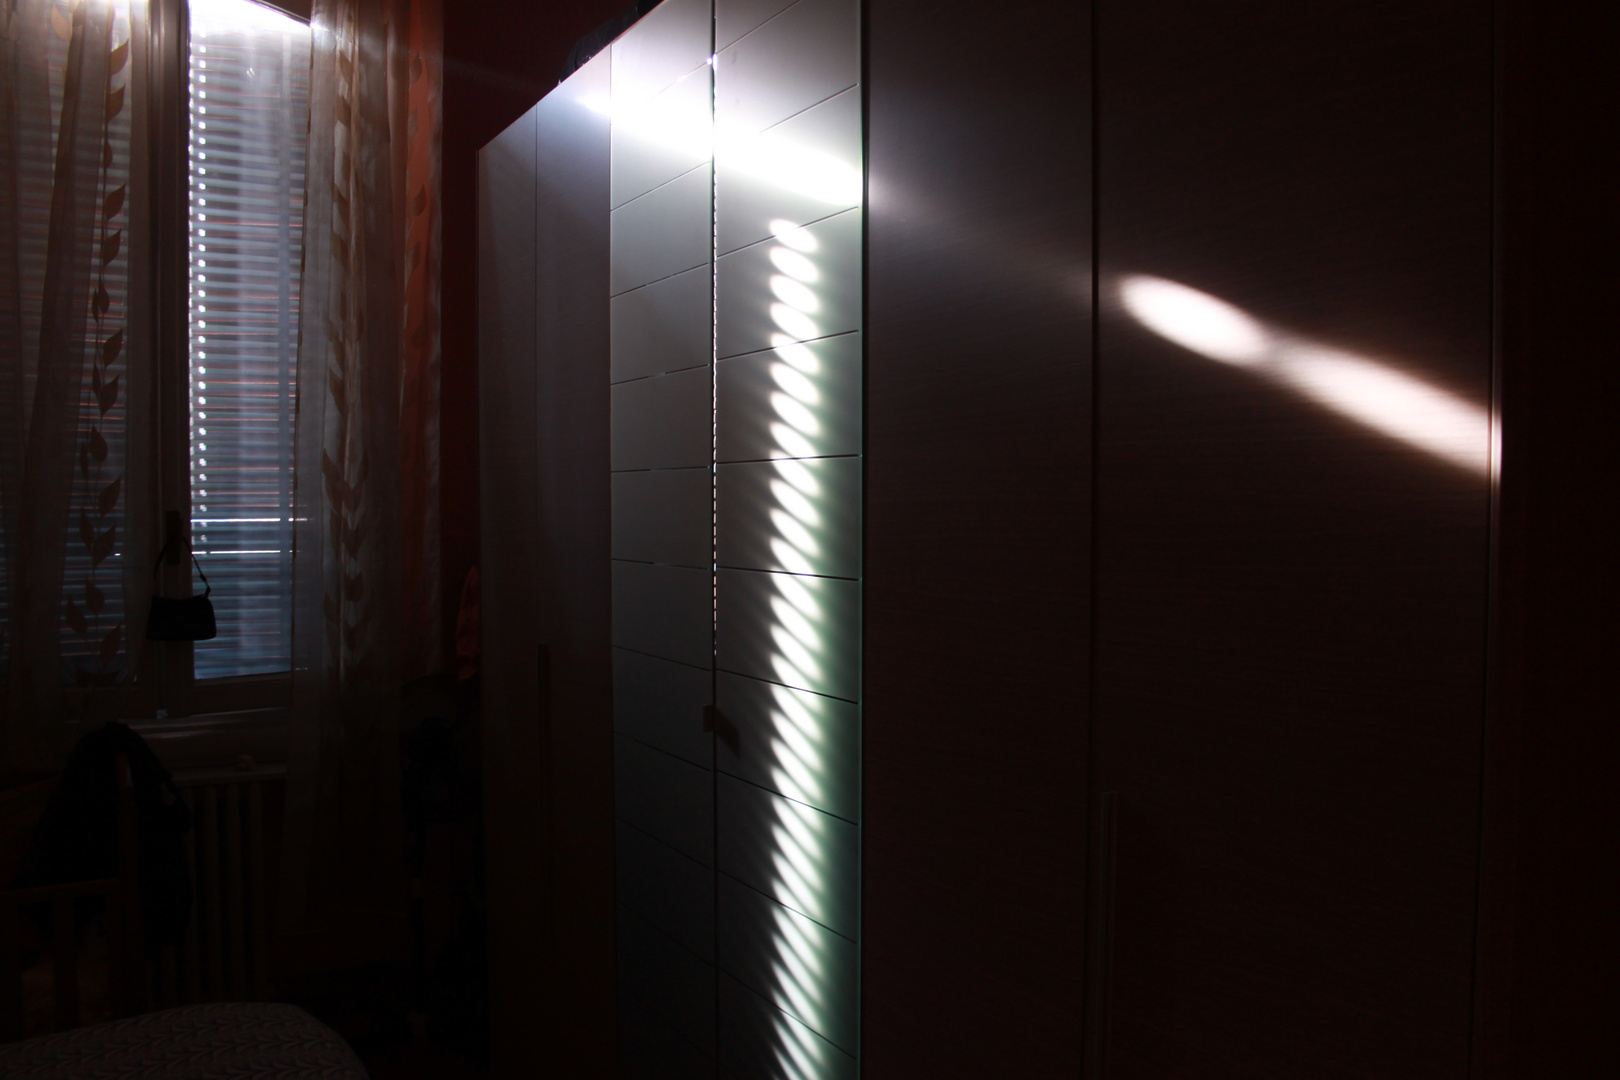 Raggi nell'armadio